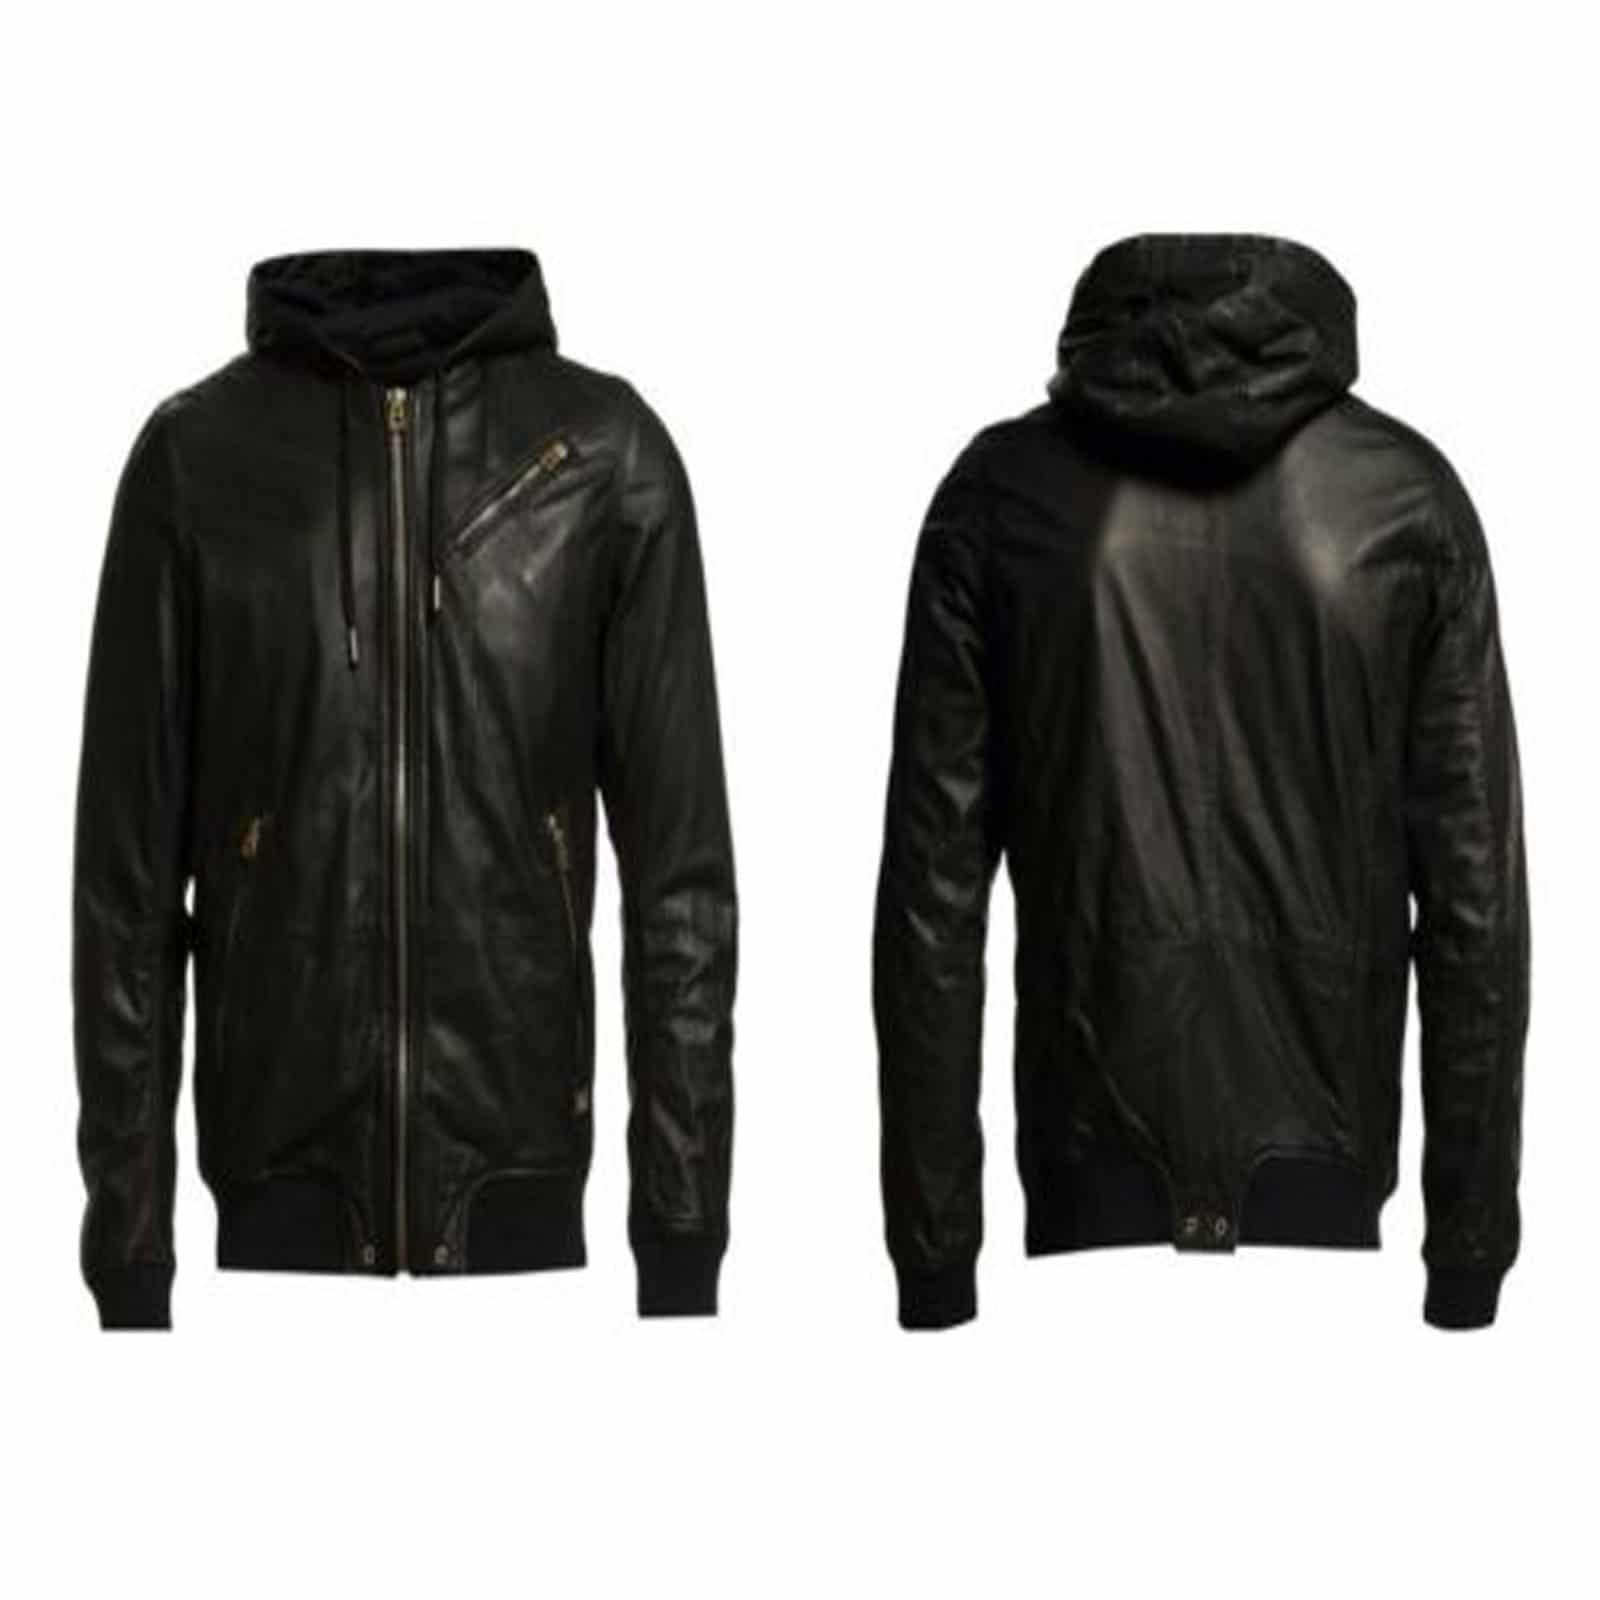 Hooded Black Leather Bomber Jacket 100 Custom Made